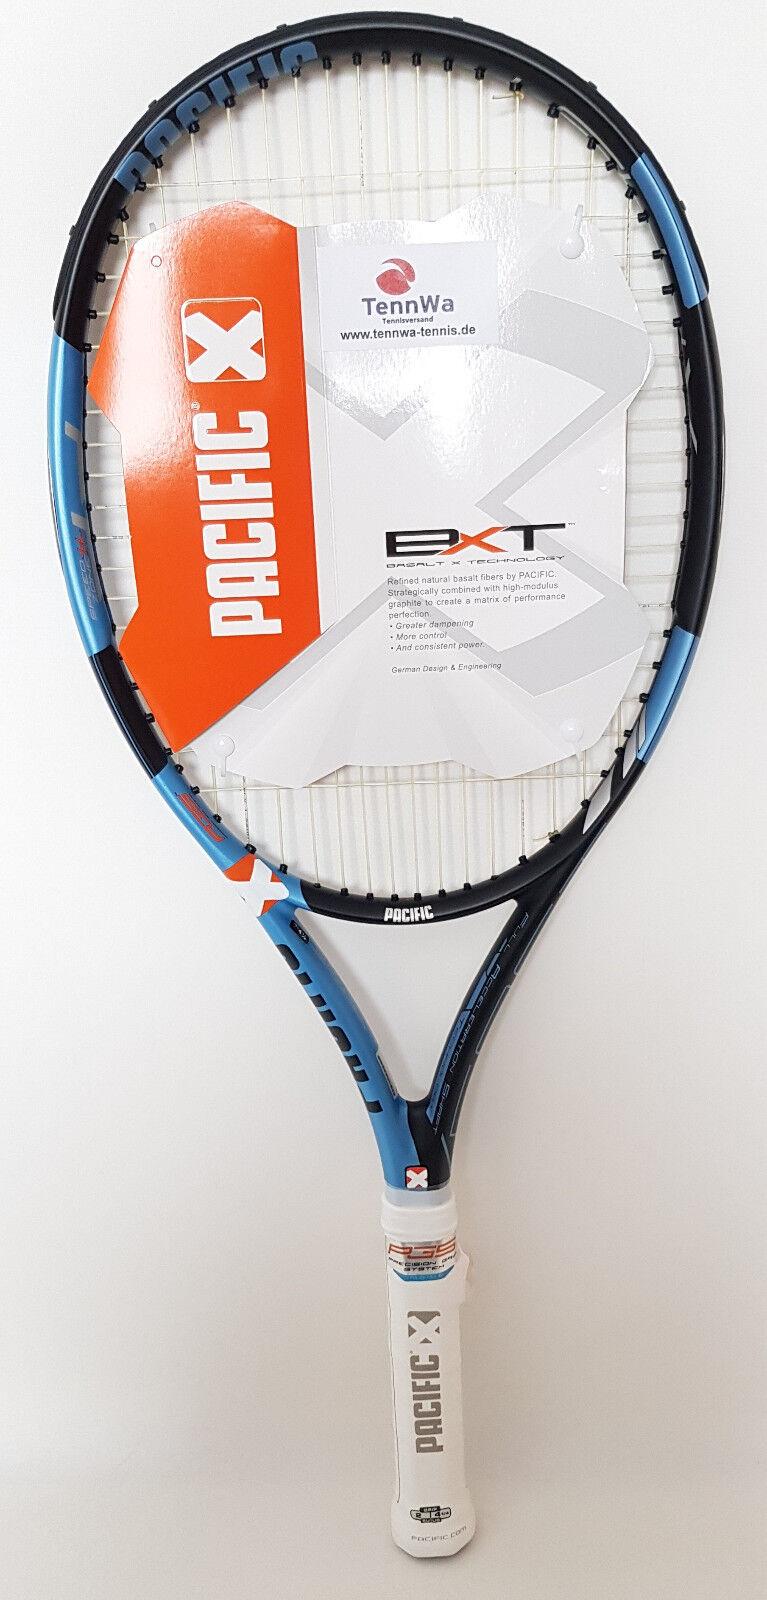 NEU: PACIFIC X Fast LT 288g - Starker Allround-Tennisschläger, besaitet